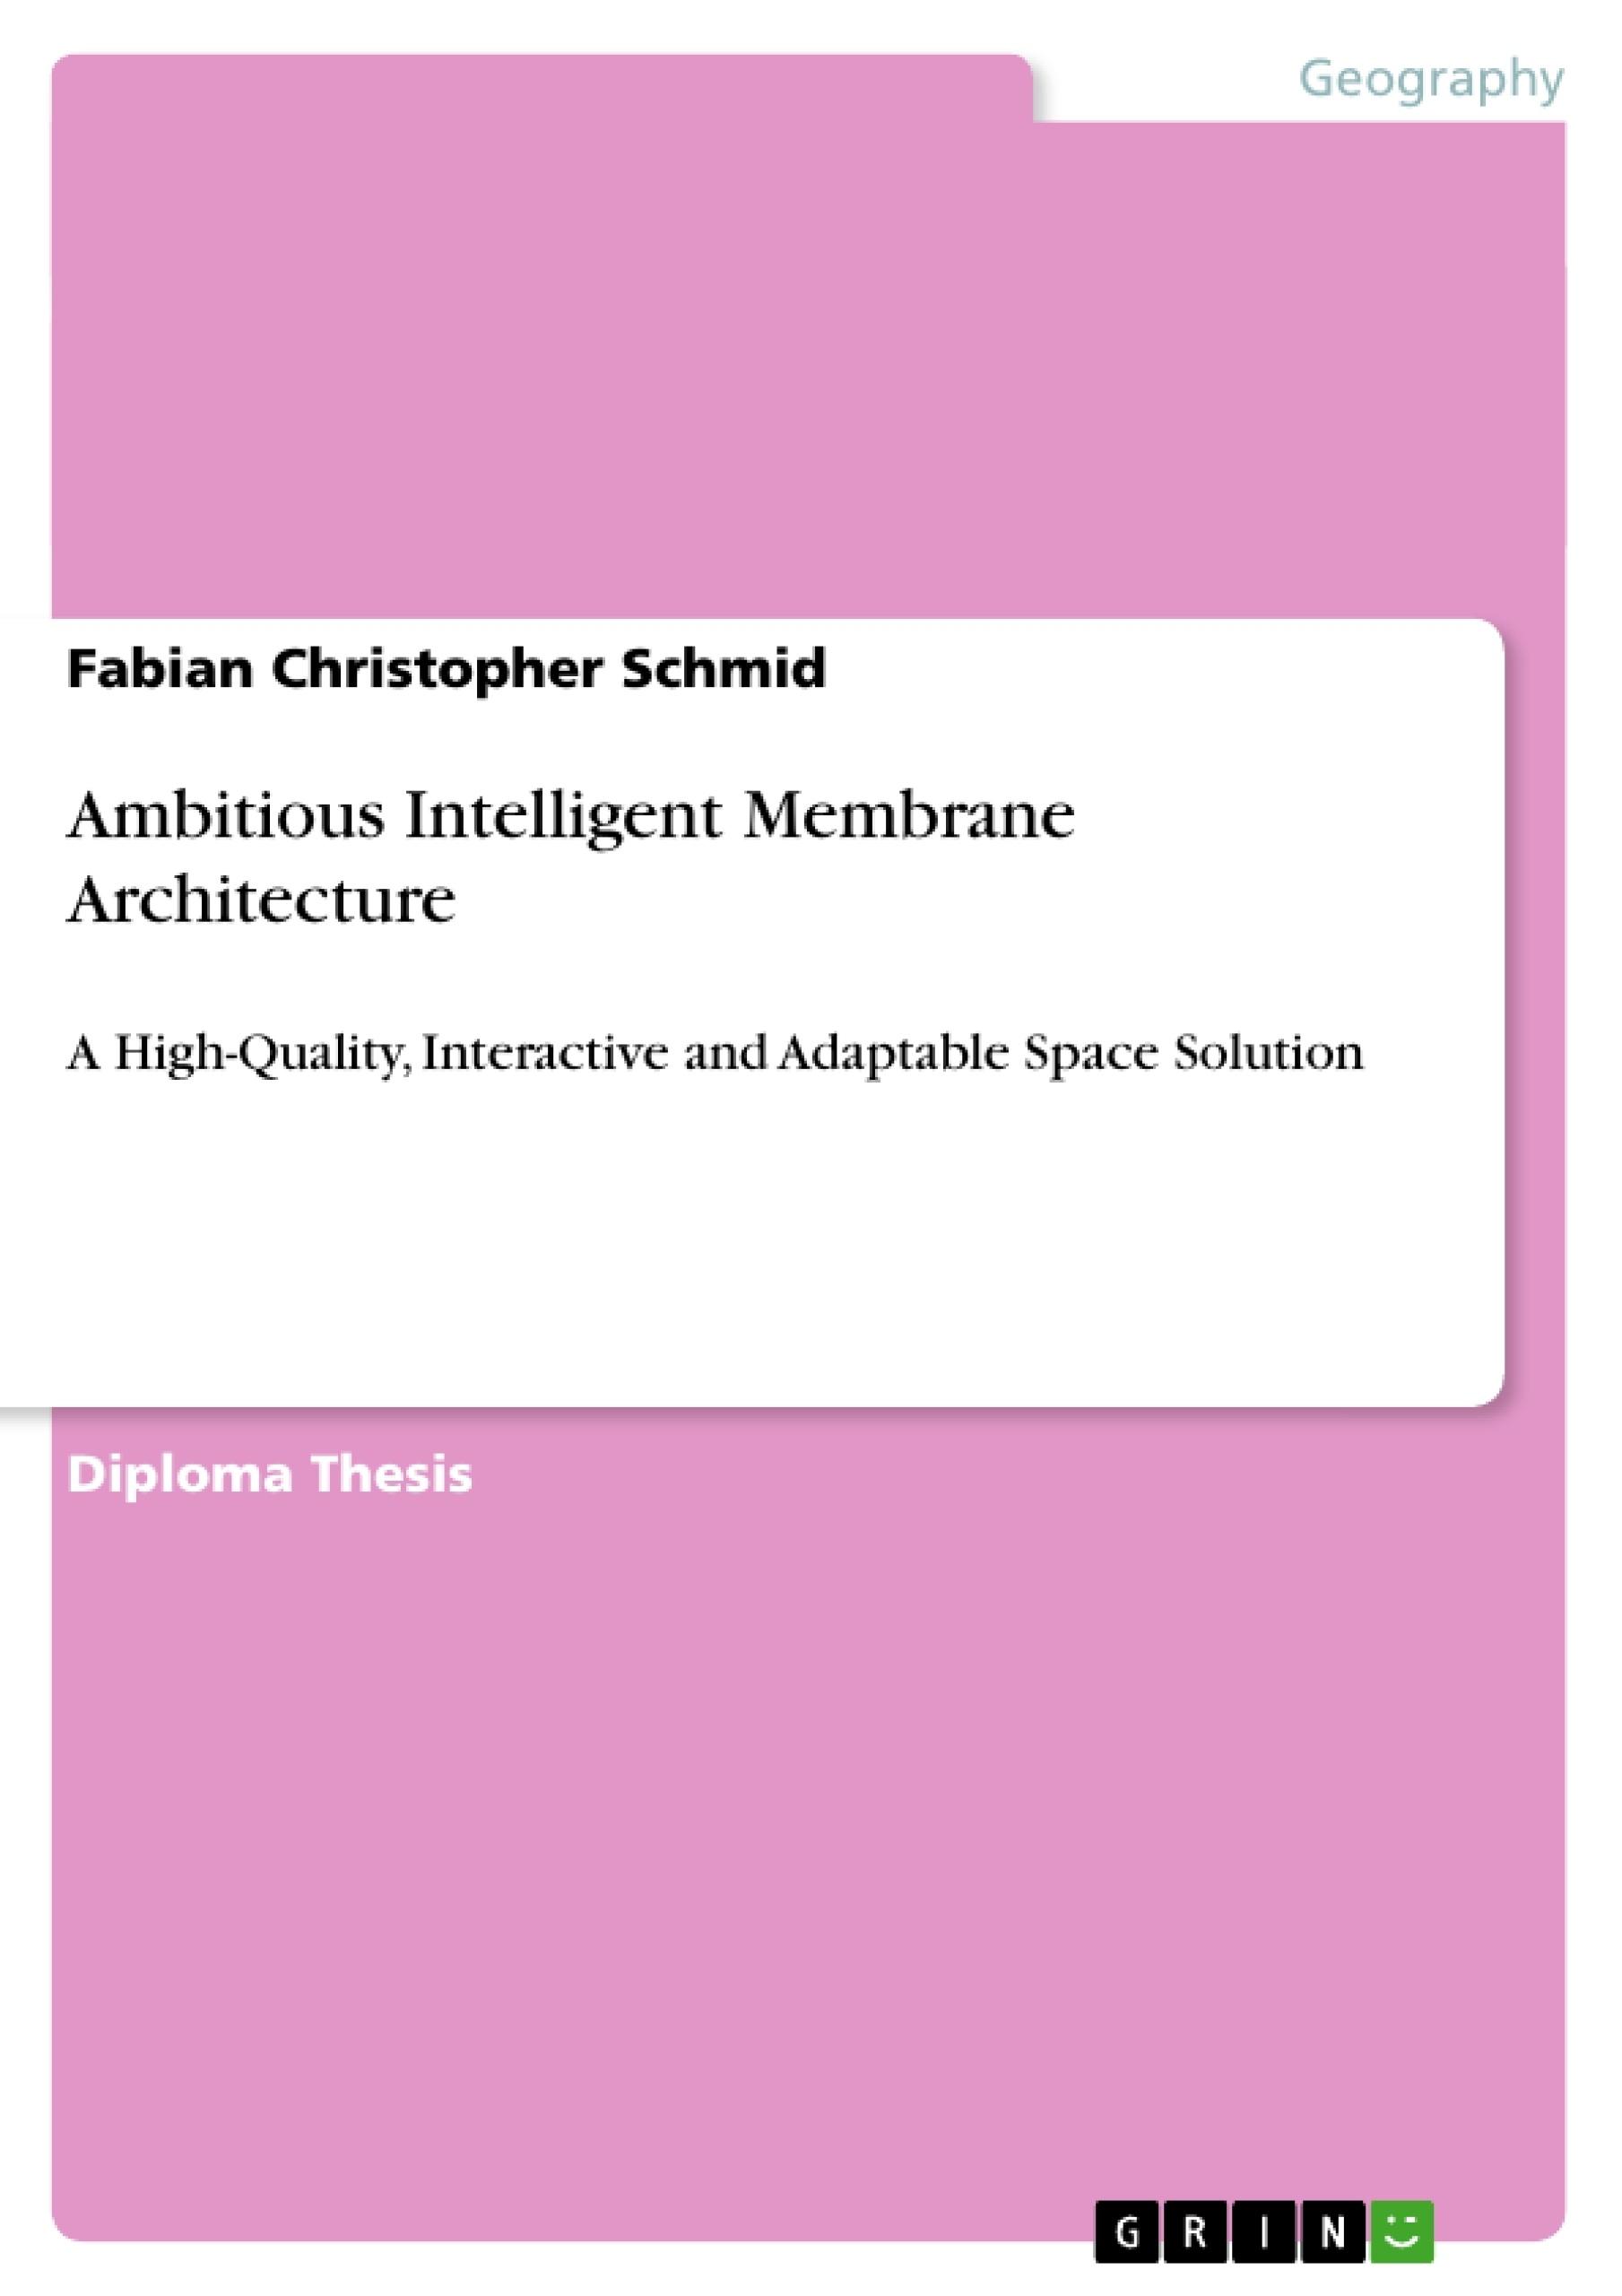 Title: Ambitious Intelligent Membrane Architecture